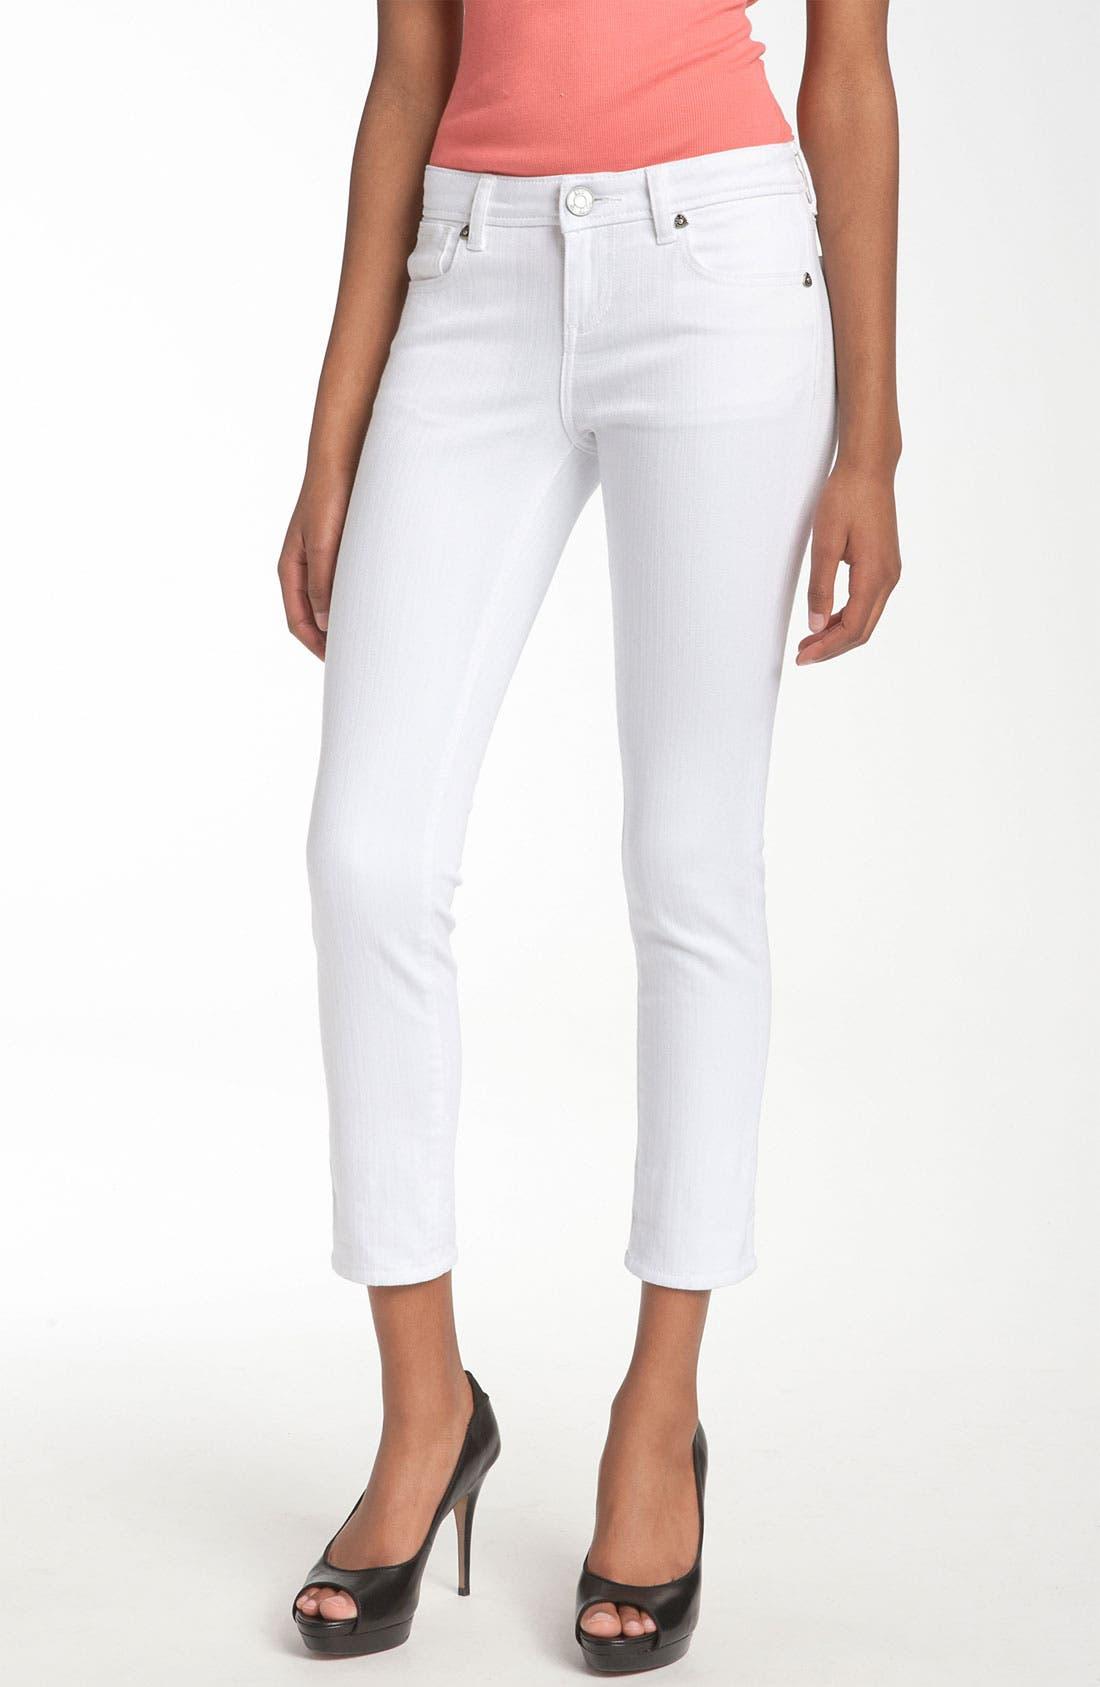 Alternate Image 3  - KUT from the Kloth 'Catherine' Slim Boyfriend Jeans (White Wash)